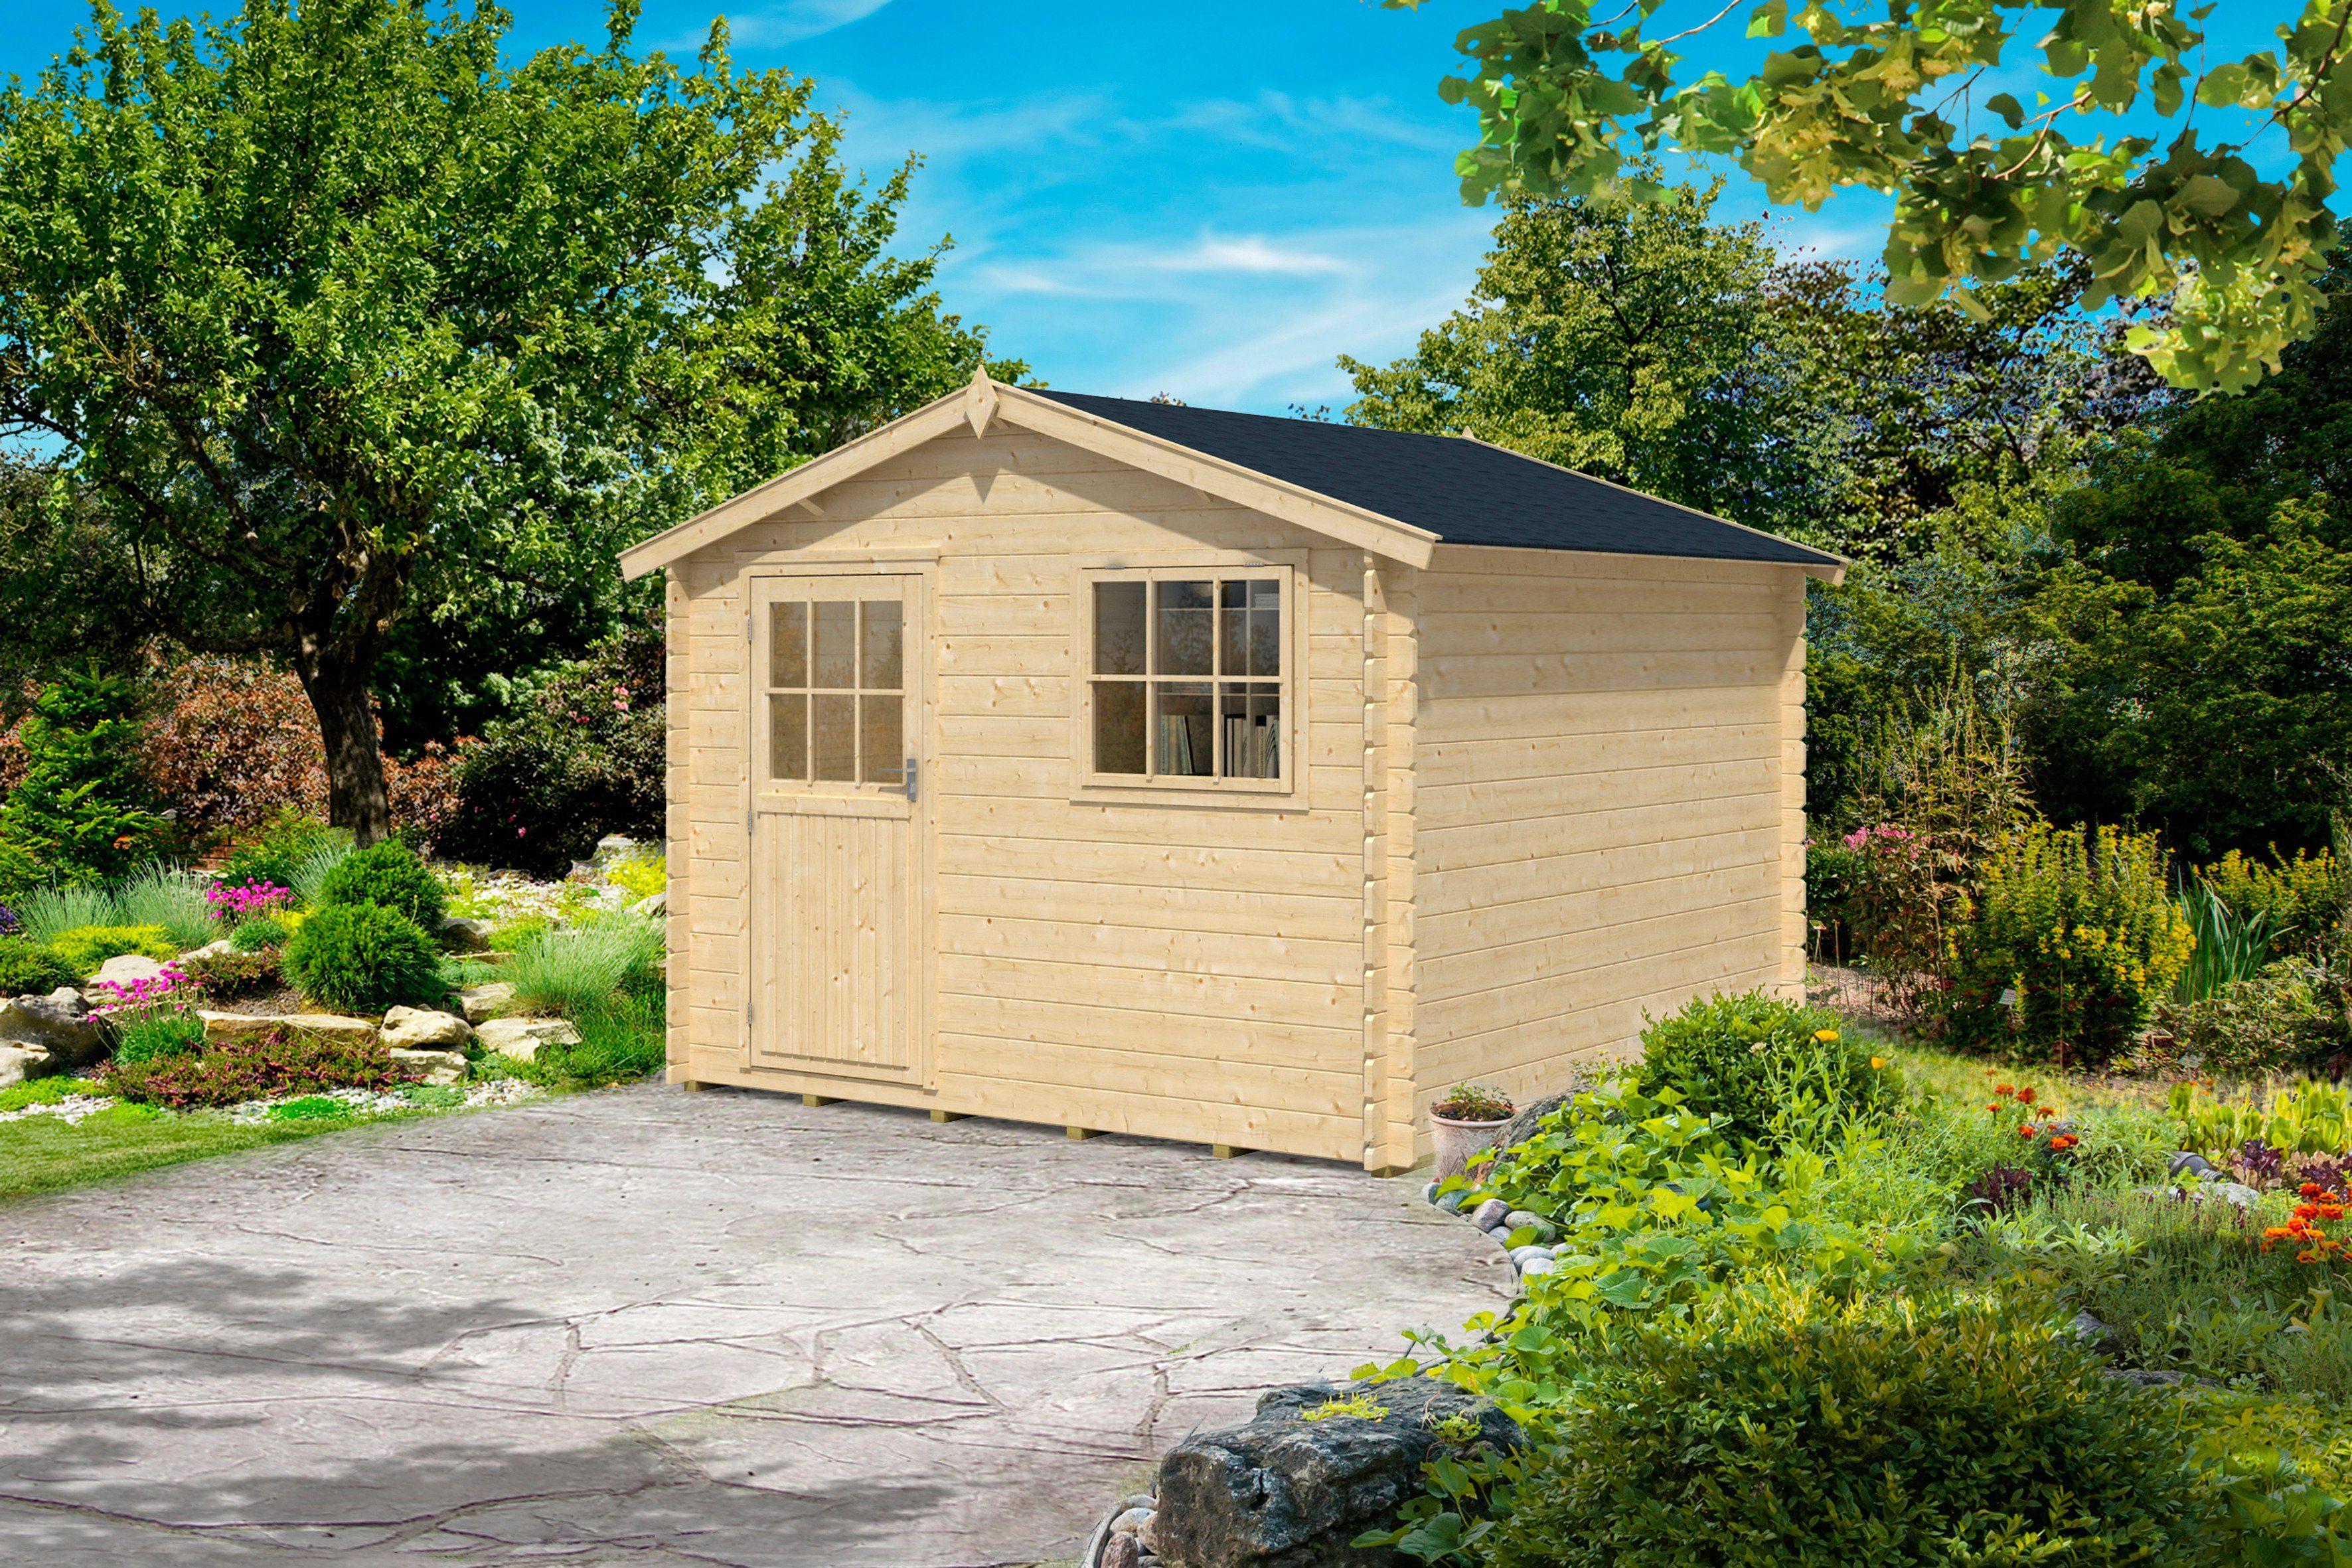 OUTDOOR LIFE PRODUCTS Gartenhaus »Mosel 3«, BxT: 300x300 cm, 28 mm